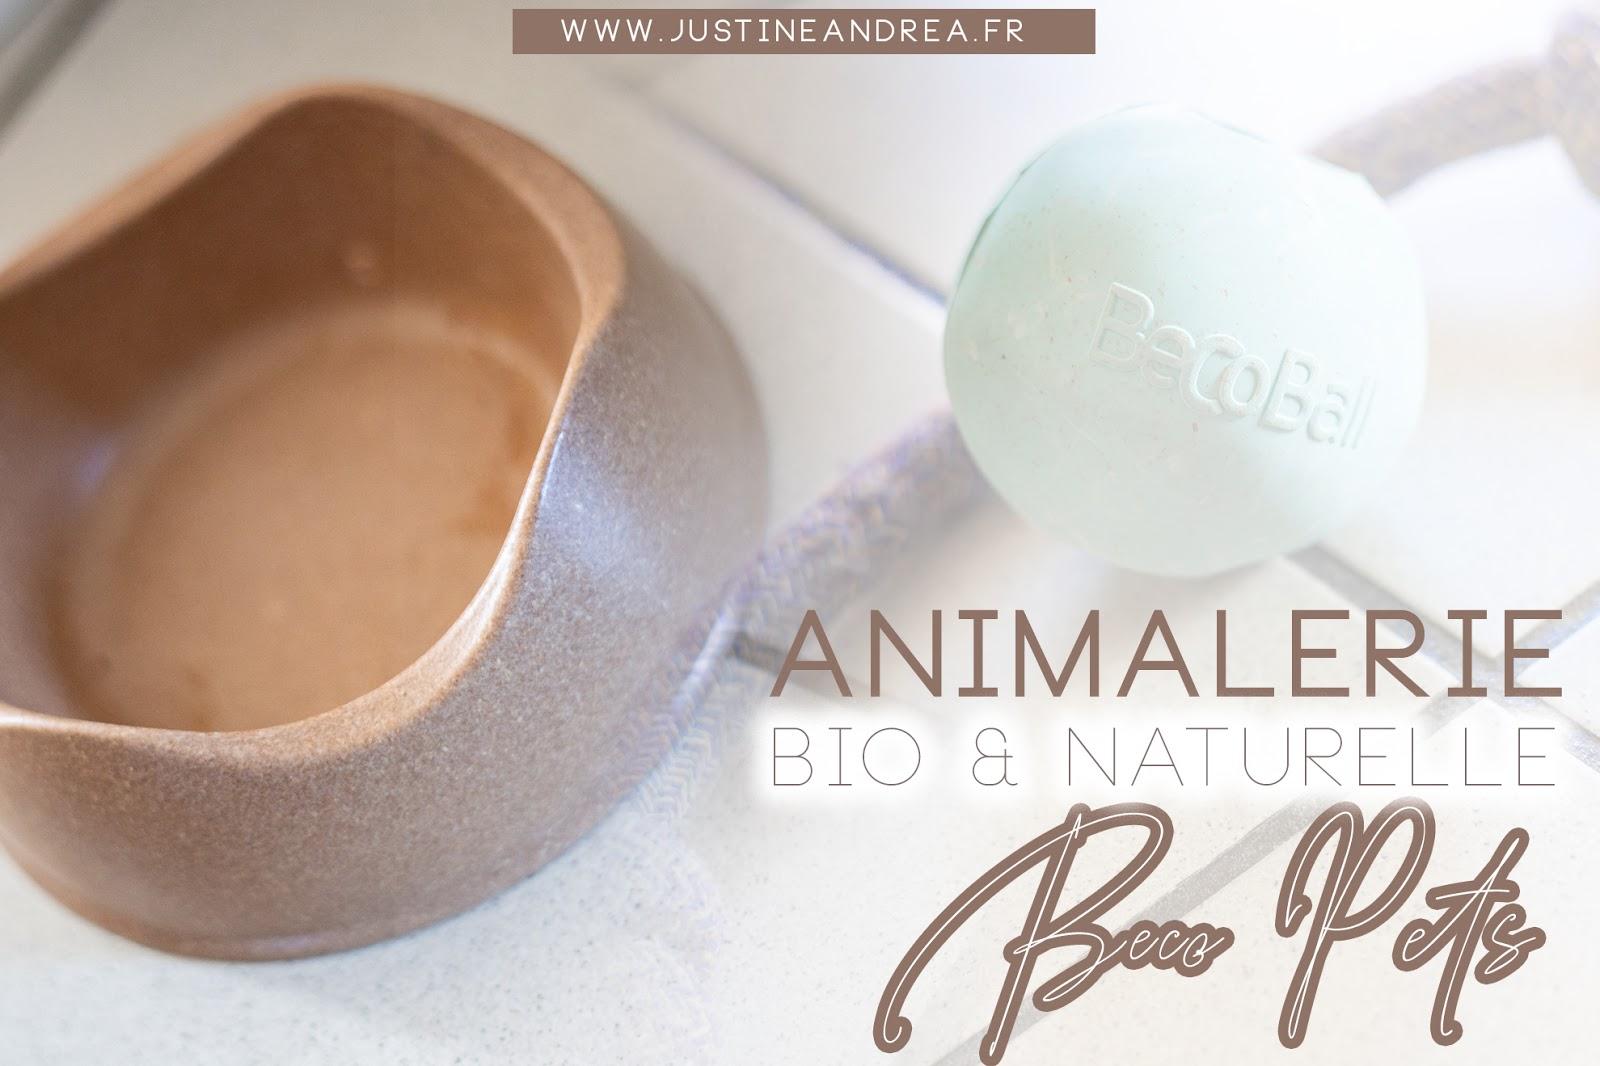 animalerie biologique et naturelle biofan - becopets